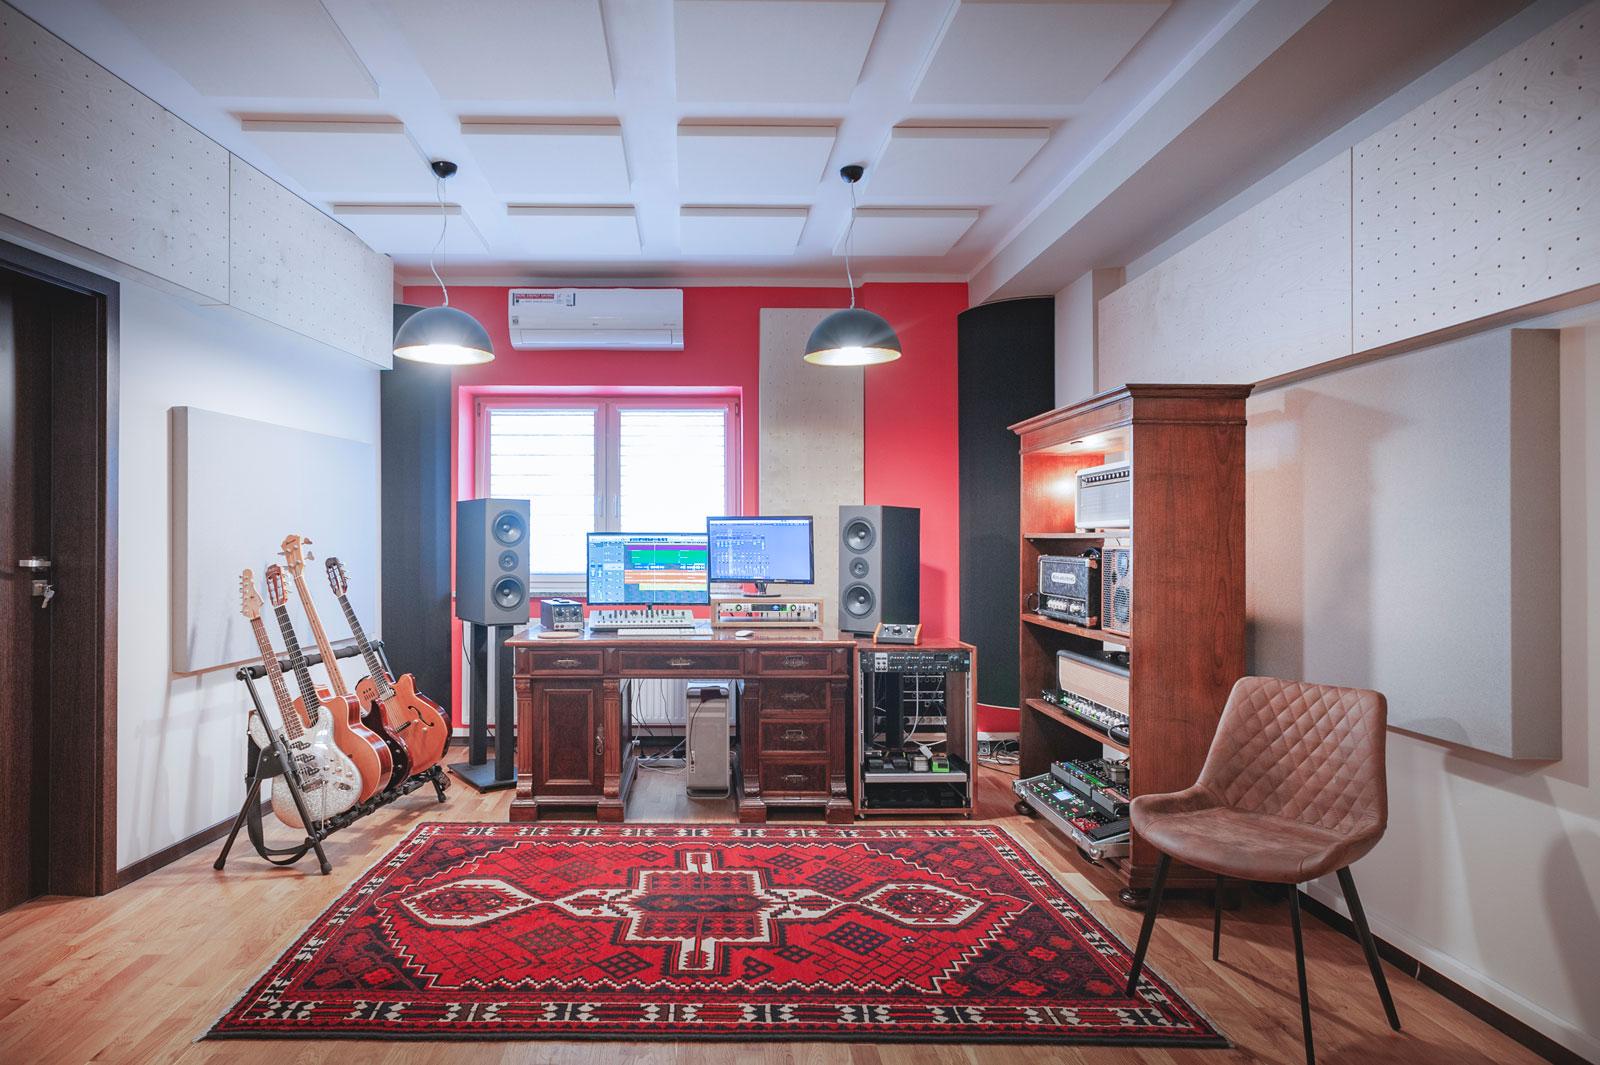 PAK studio Katy Wroc 001